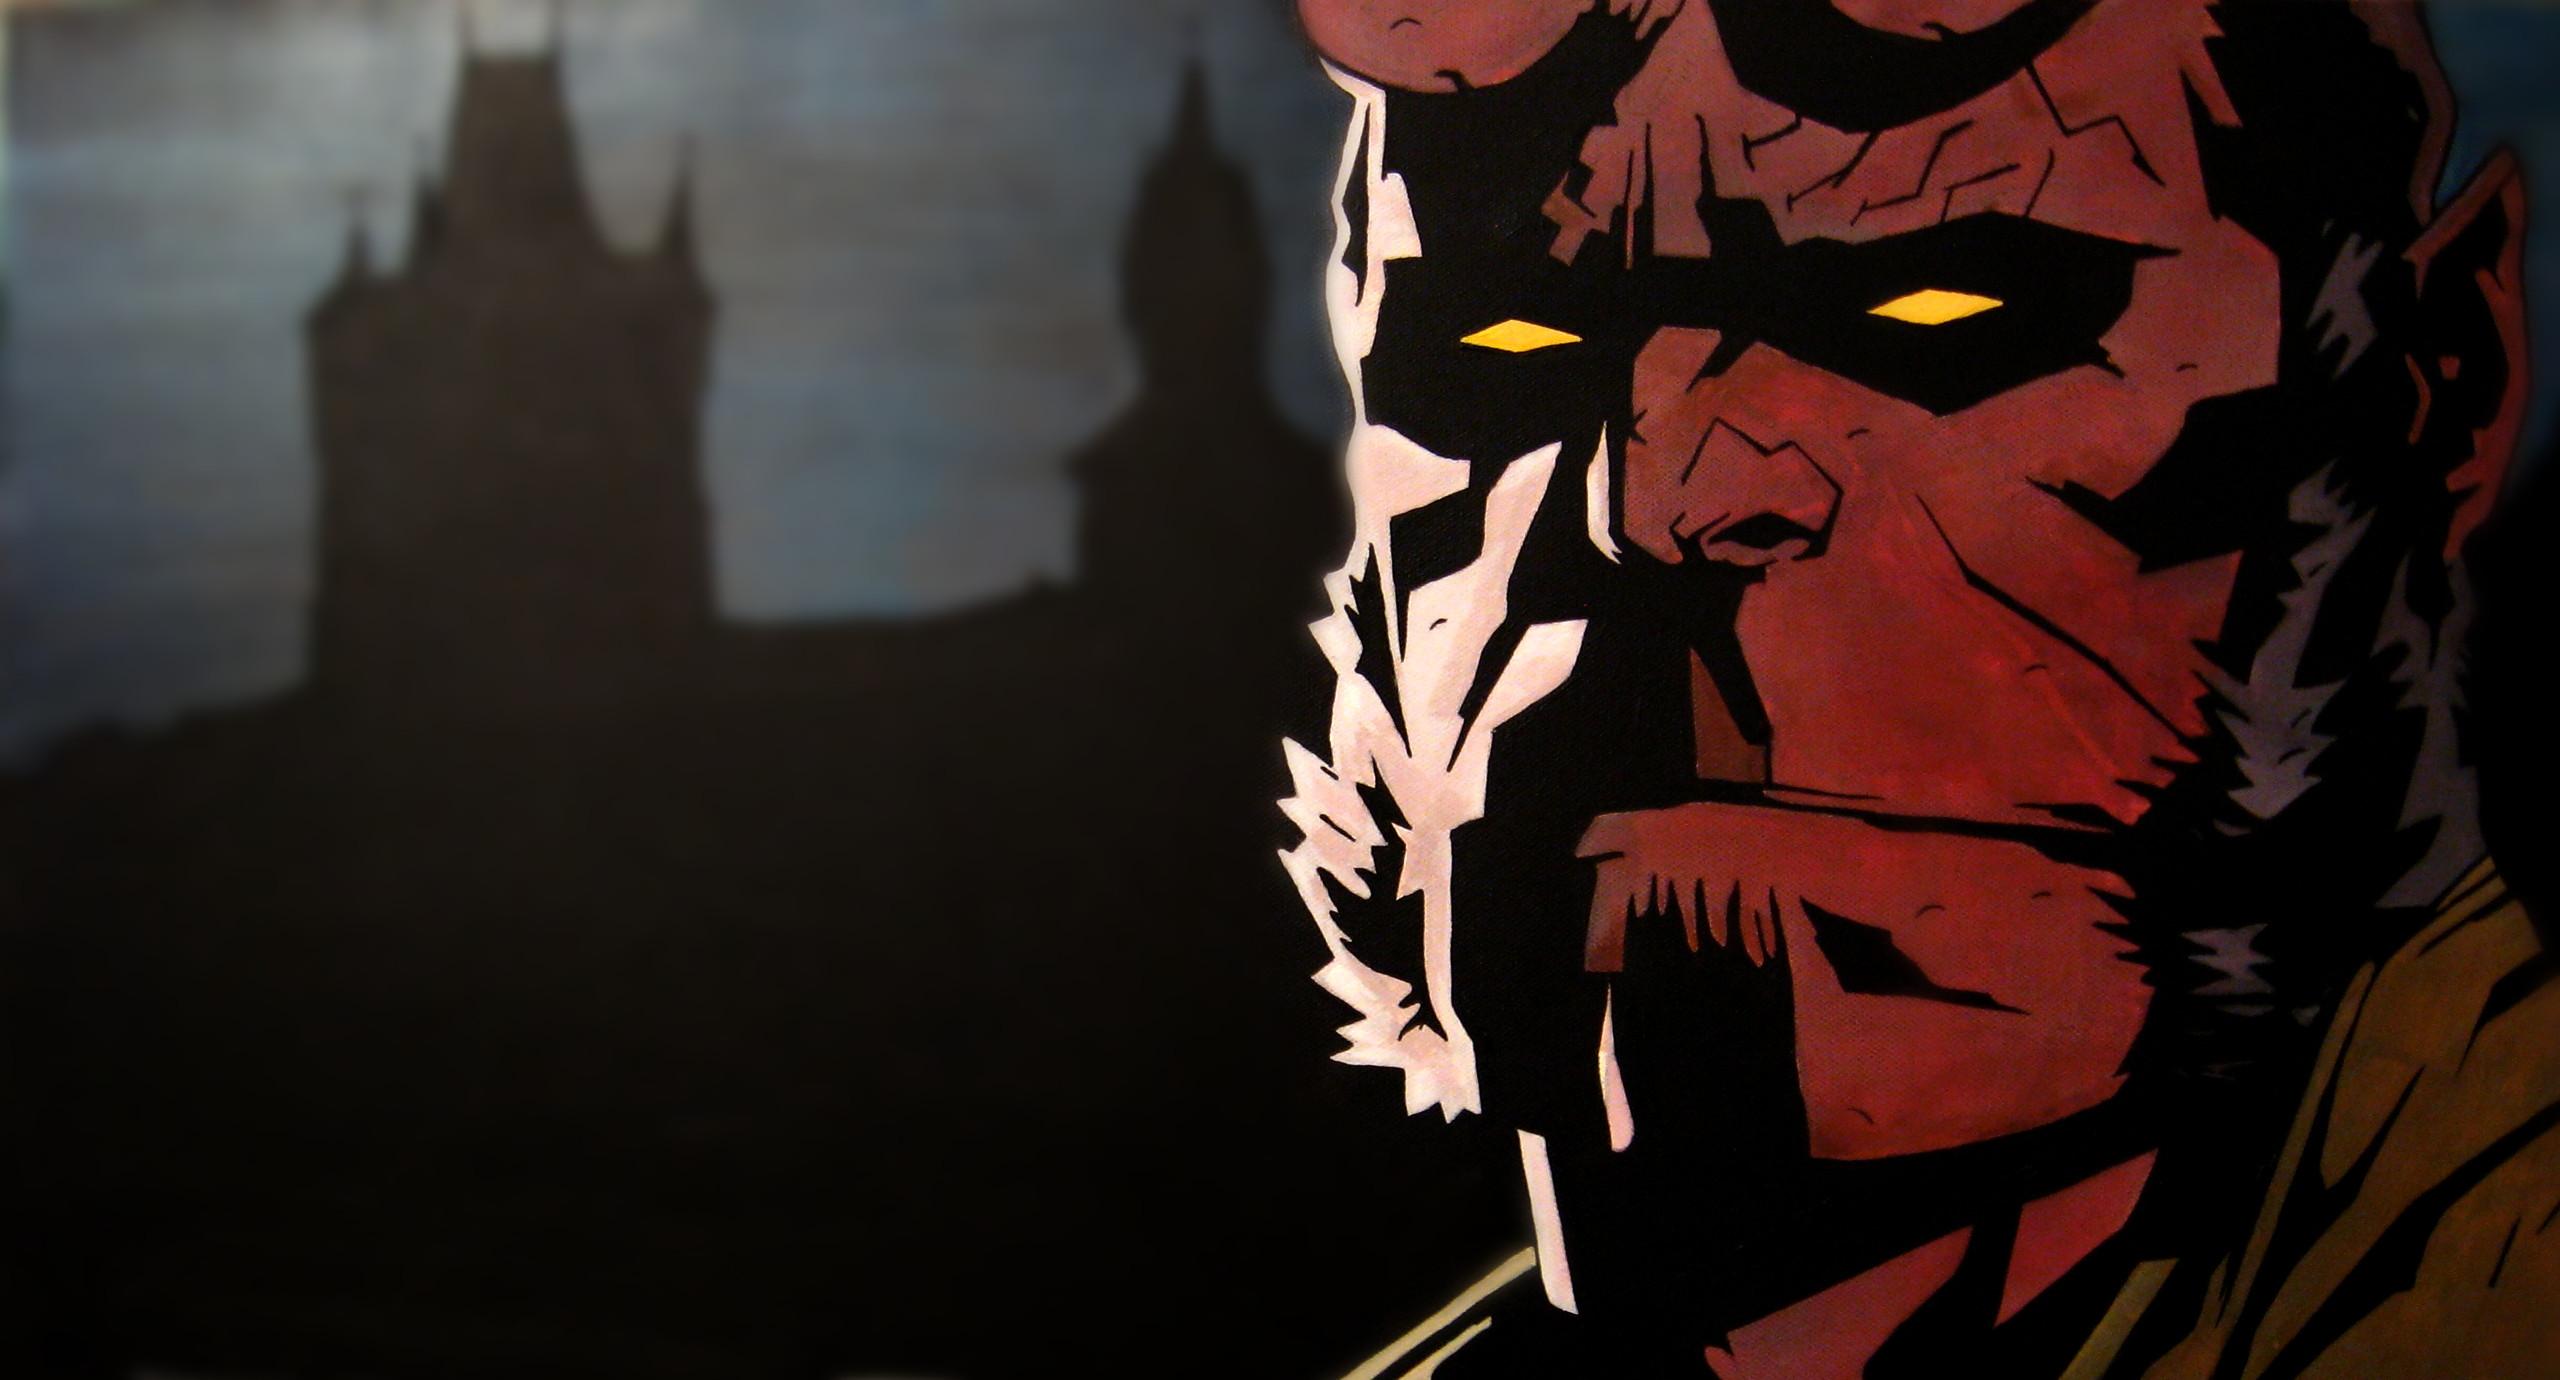 Ian McShane rejoint le casting d'Hellboy